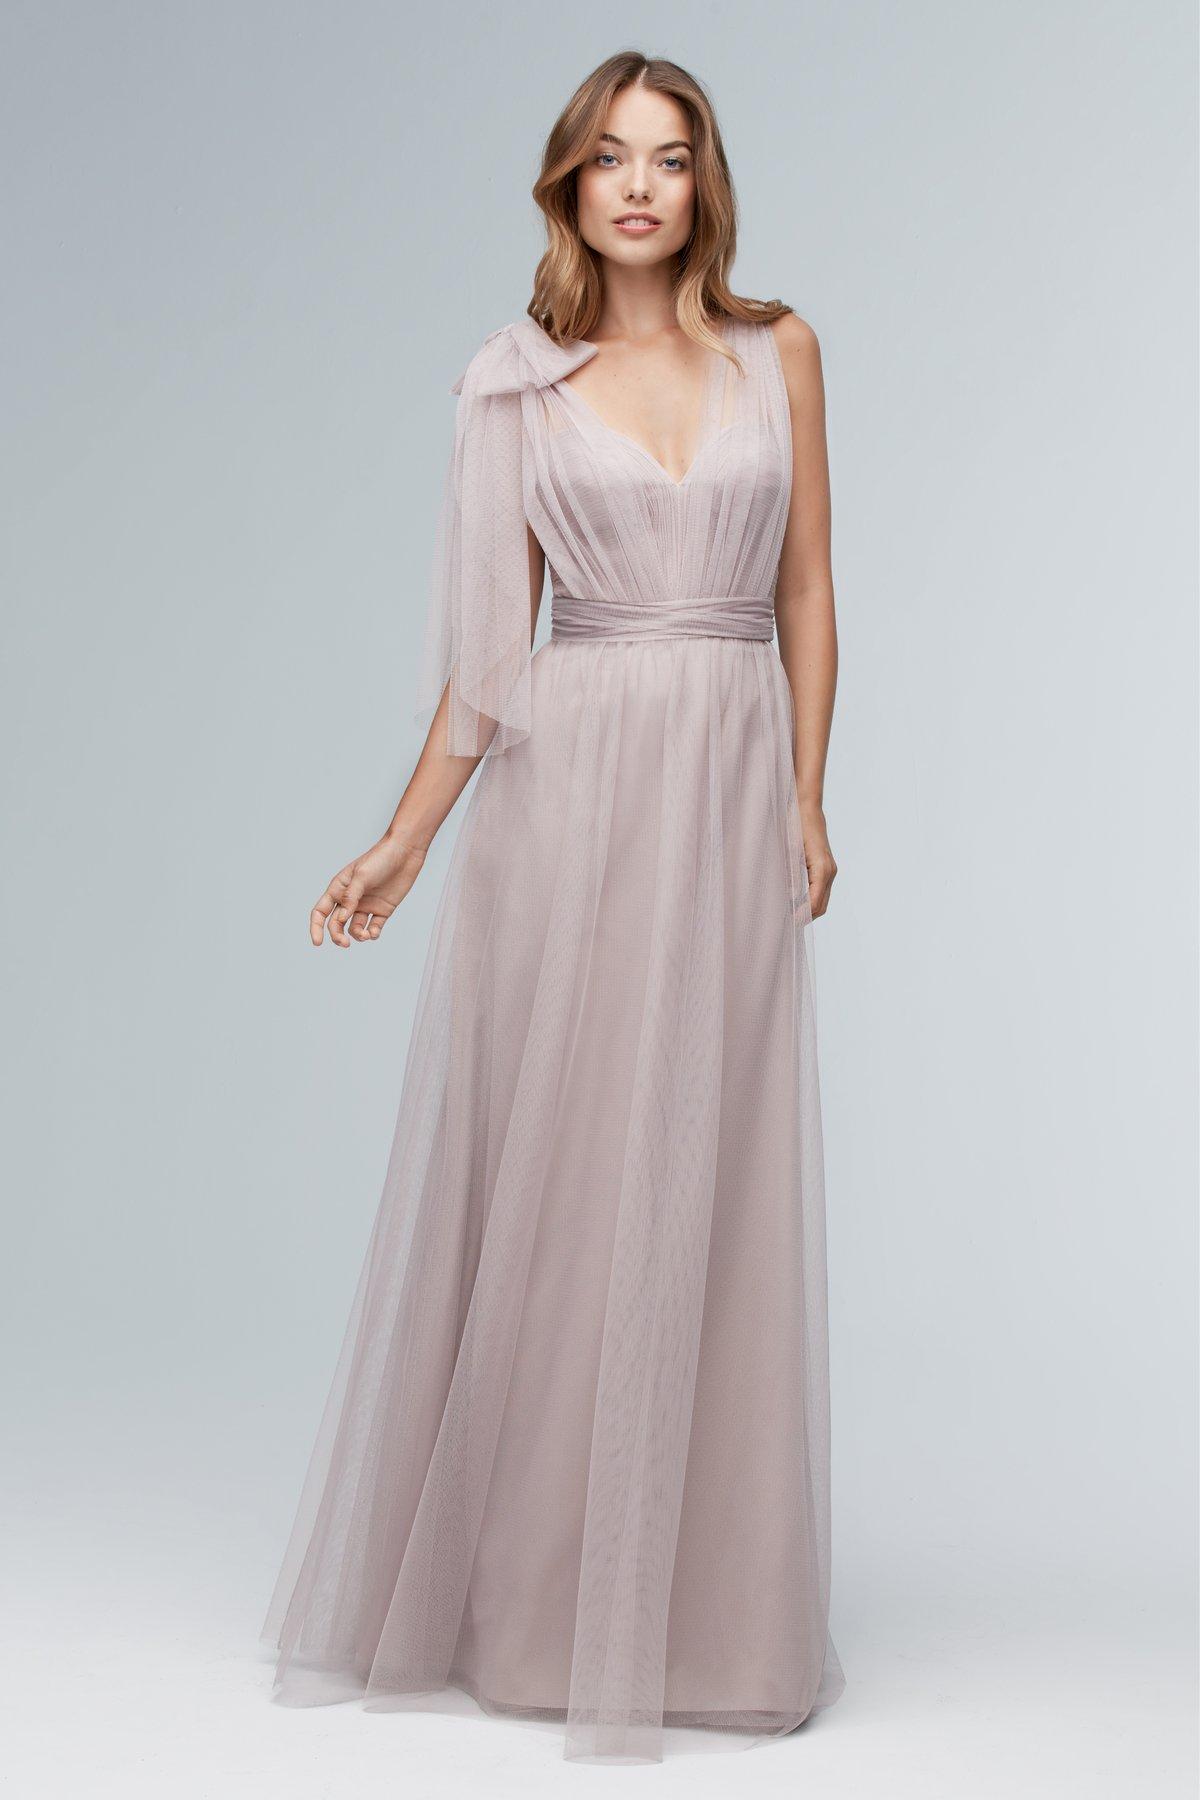 WTOO - Long - 8 - VeLace Bridal - Wedding Dresses Bellingham MA